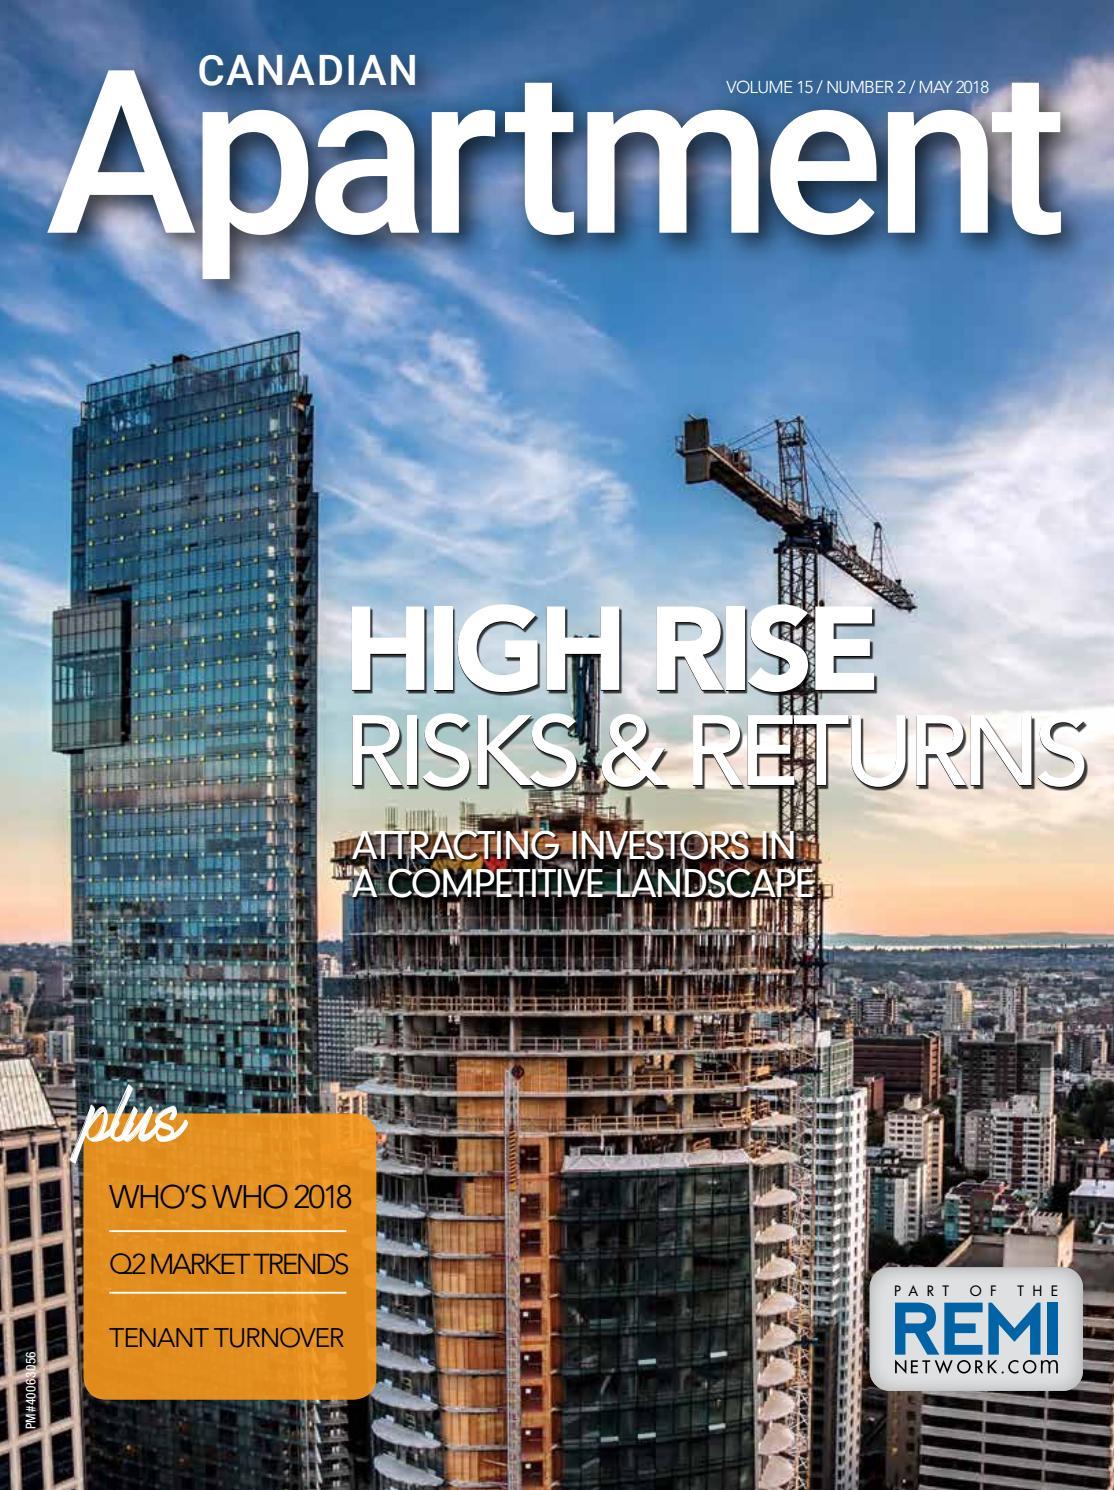 Canadian Apartment Magazine by MediaEdge - issuu